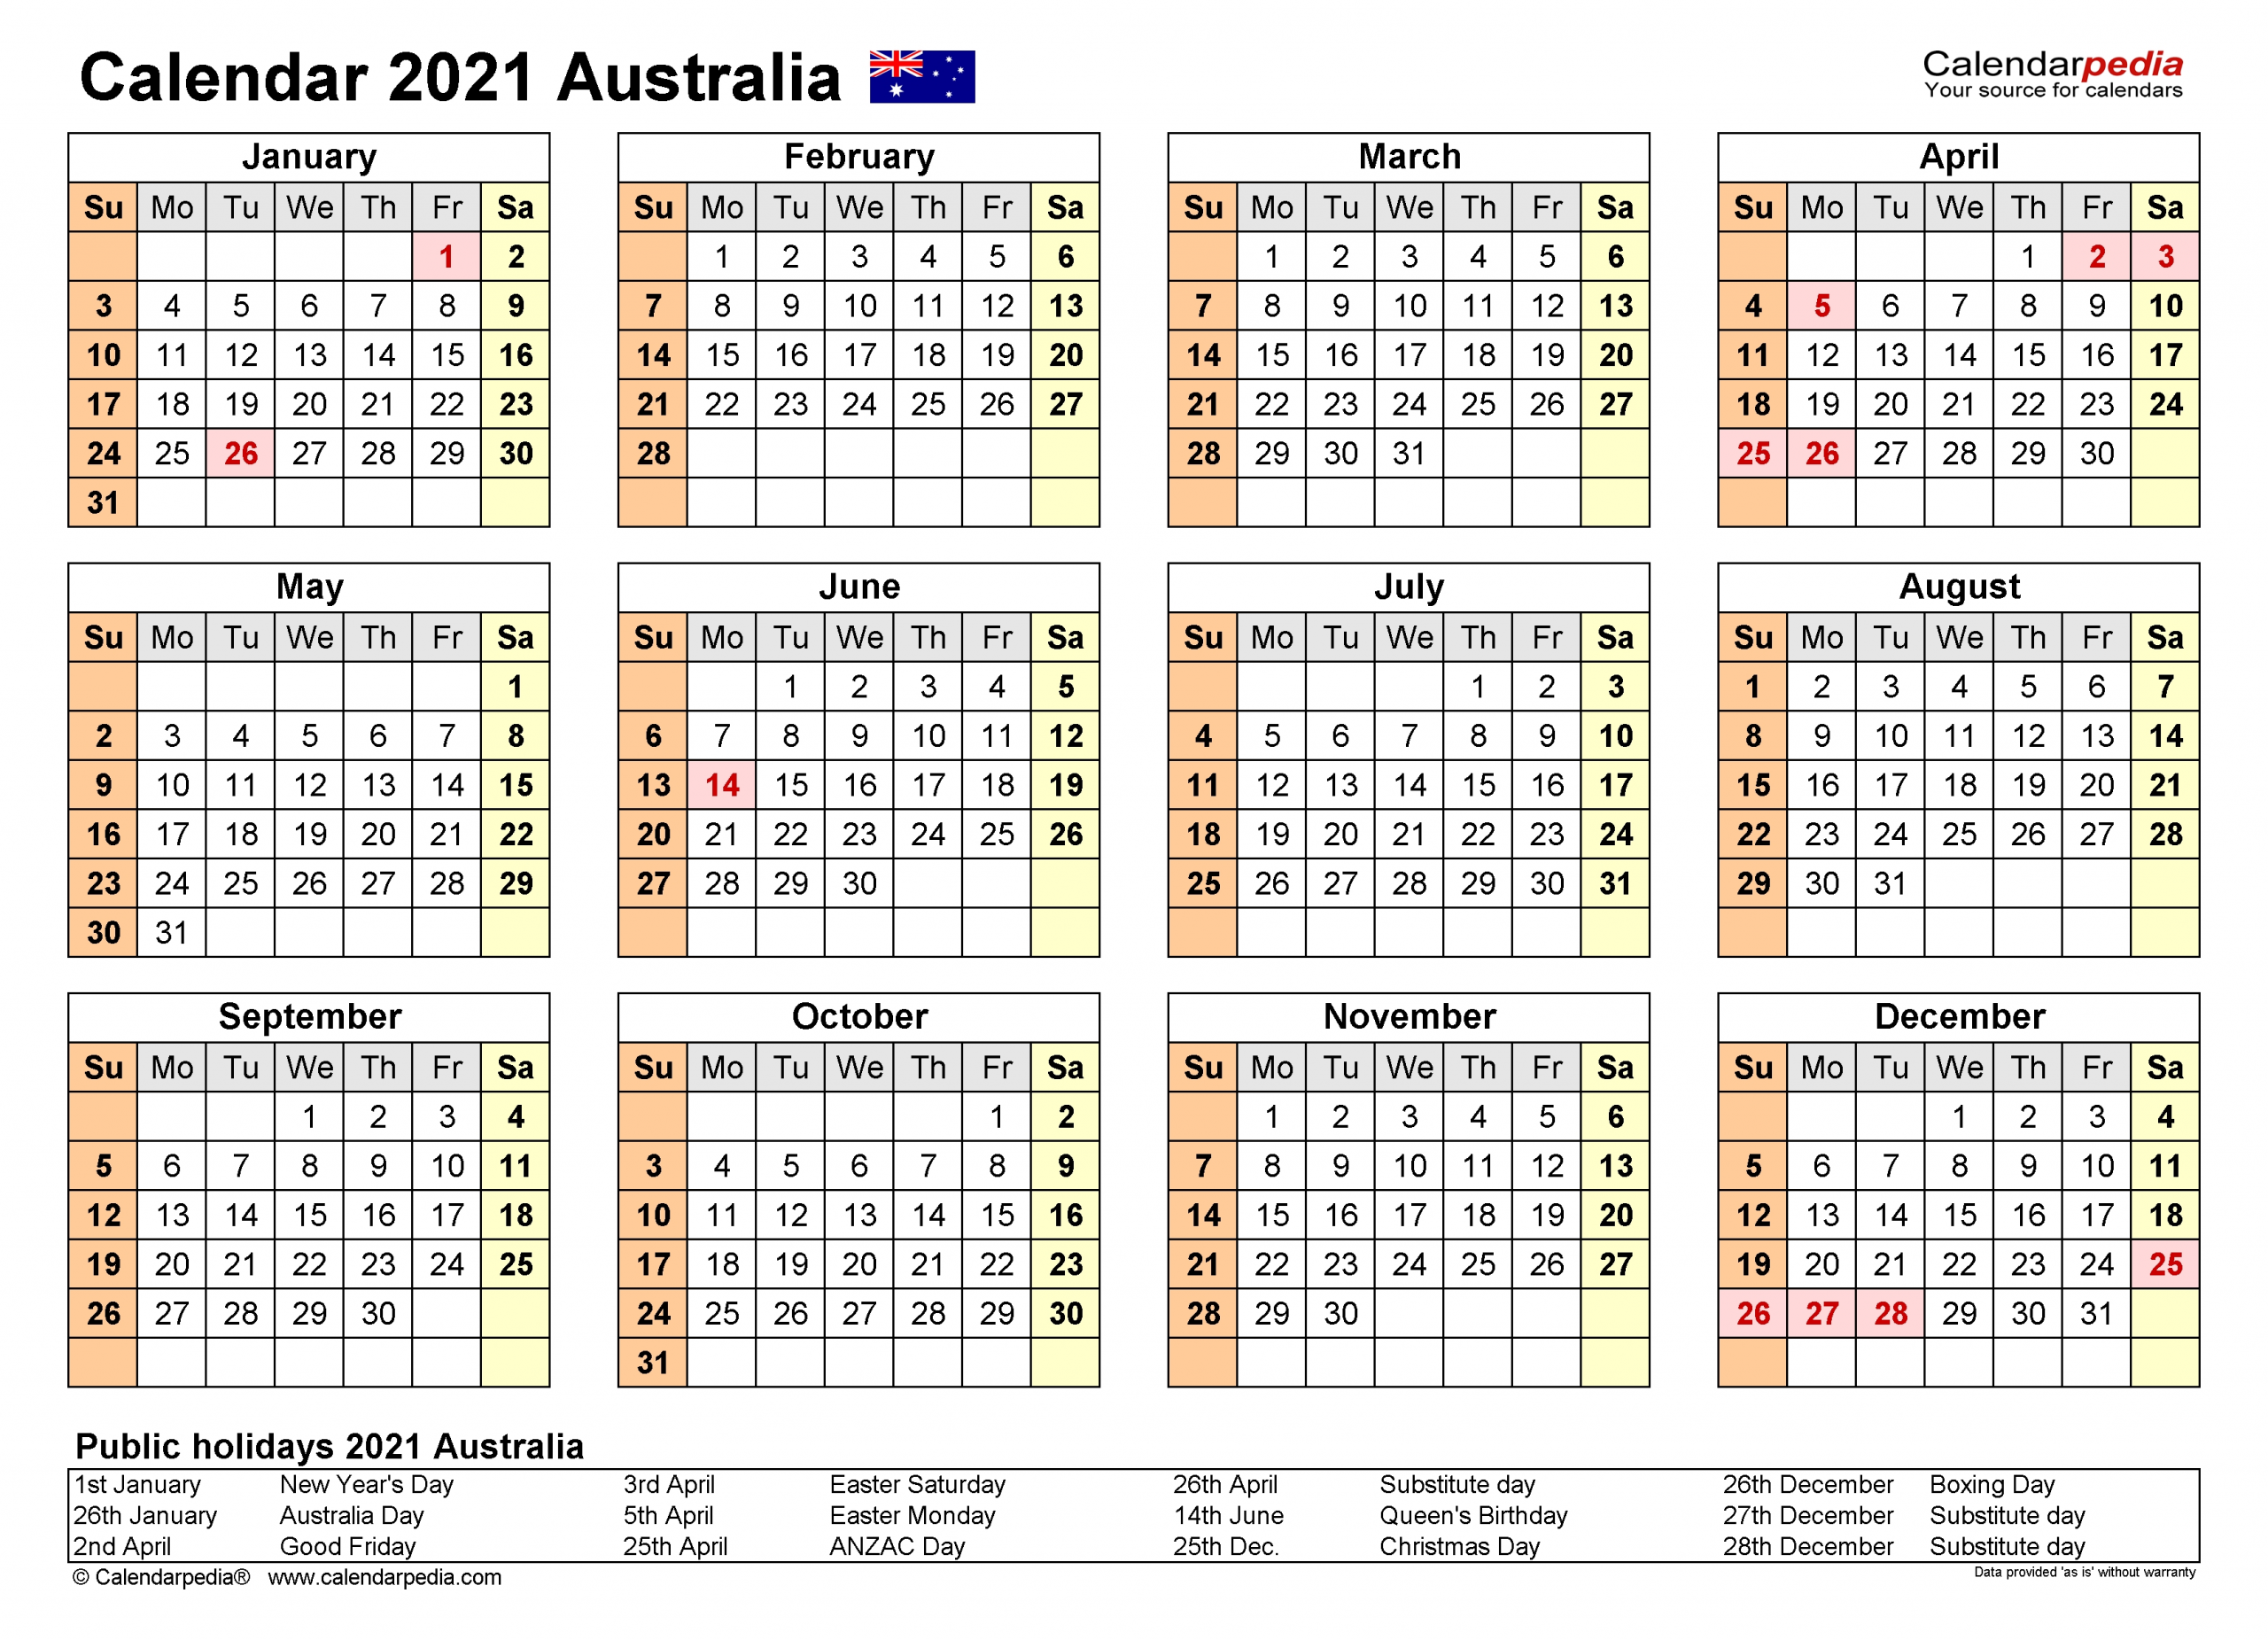 Australia Calendar 2021 - Free Printable Pdf Templates  Financial Year Calendar 2021 Australia